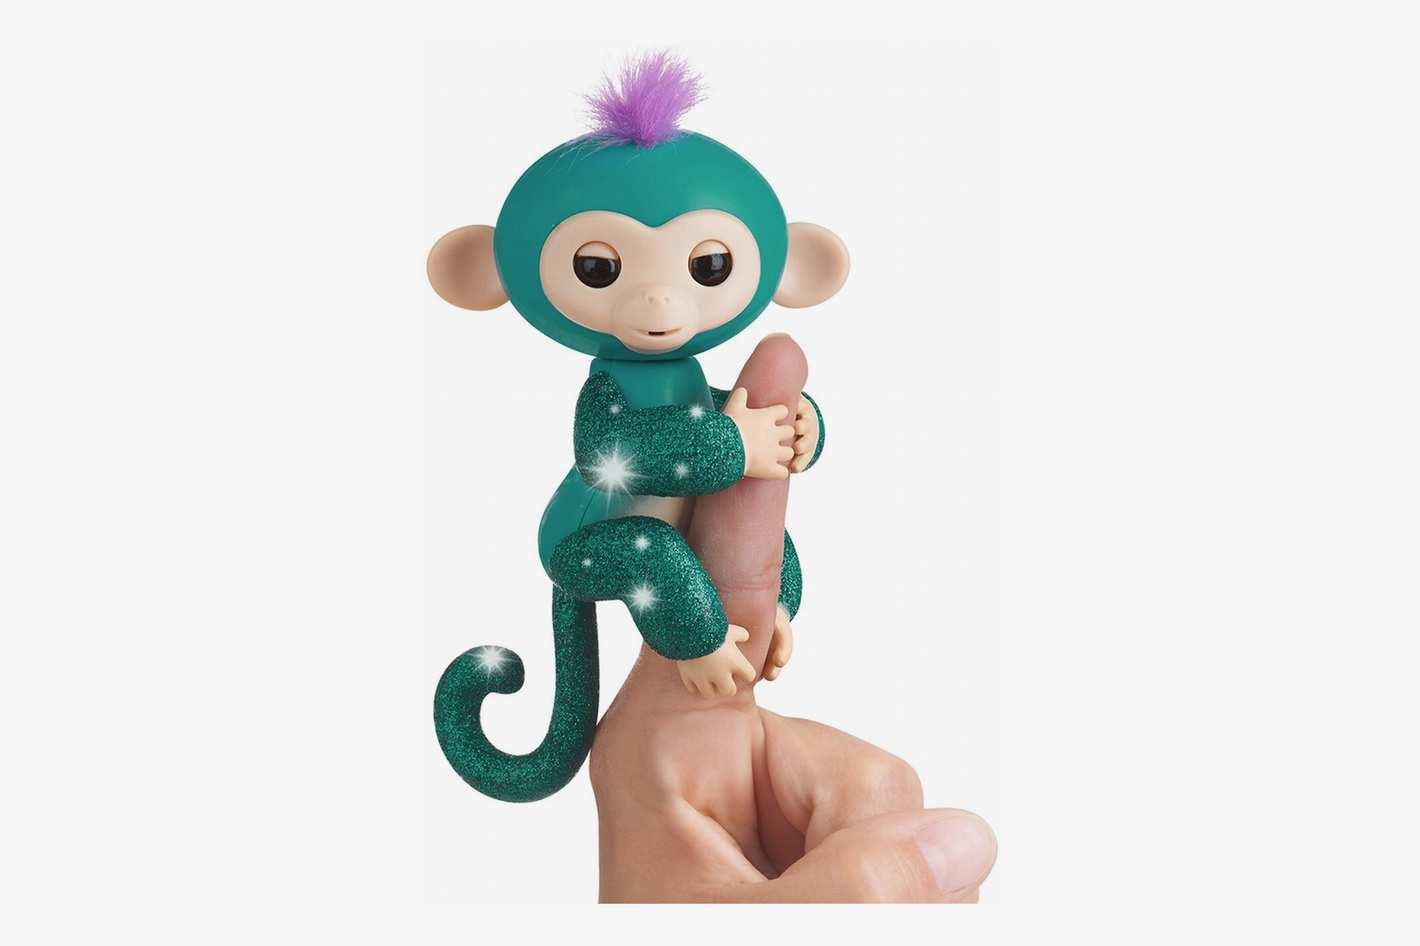 Fingerlings Glitter Monkey - Quincy - Teal Glitter - Interactive Baby Pet